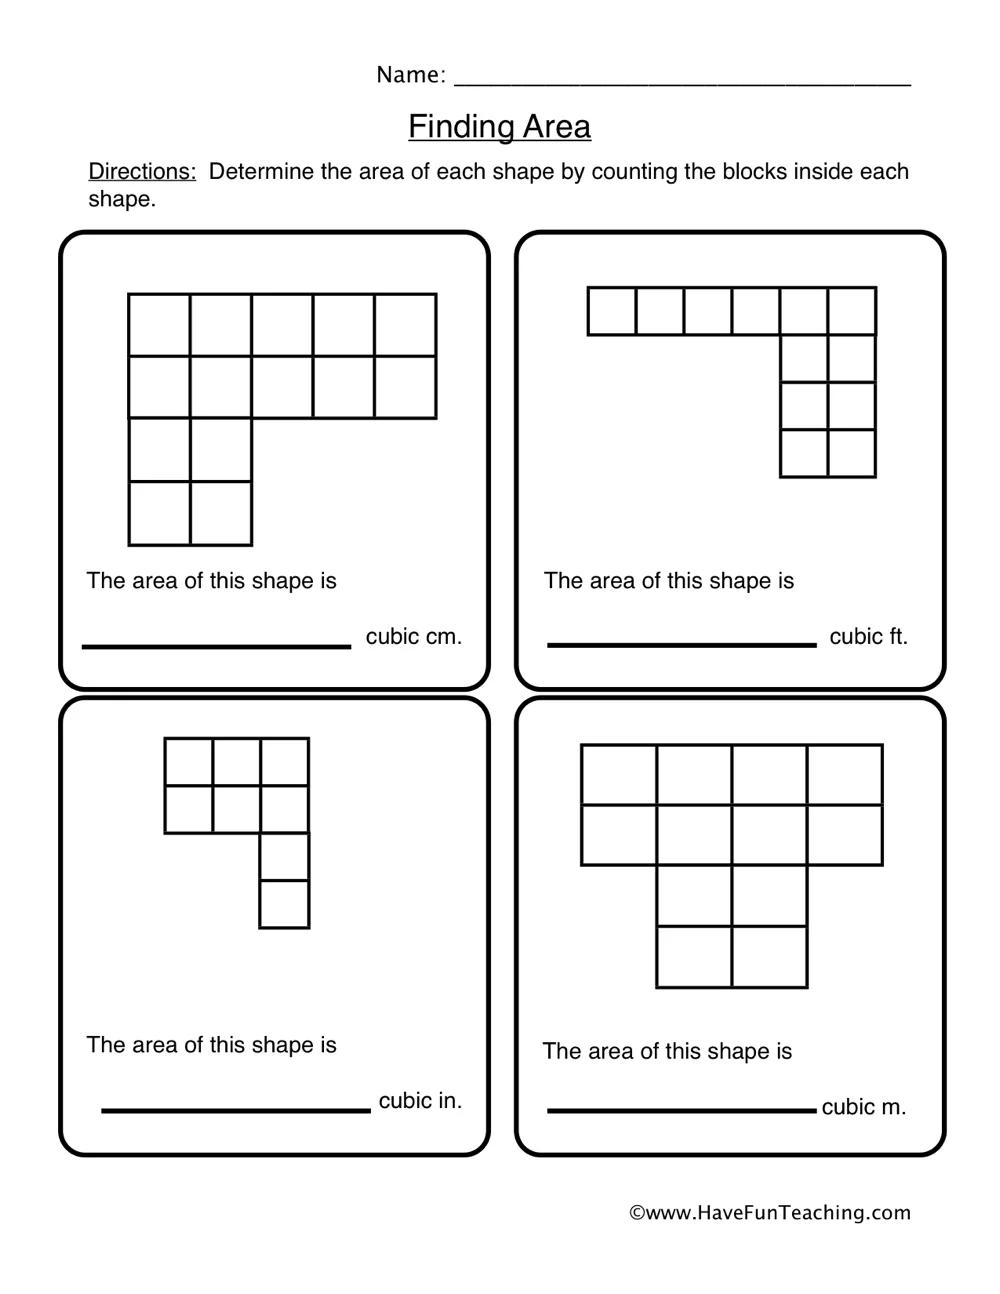 Finding Area Of Irregular Shapes Worksheet Area Worksheets Geometry Worksheets Shapes Worksheets [ 1294 x 1000 Pixel ]